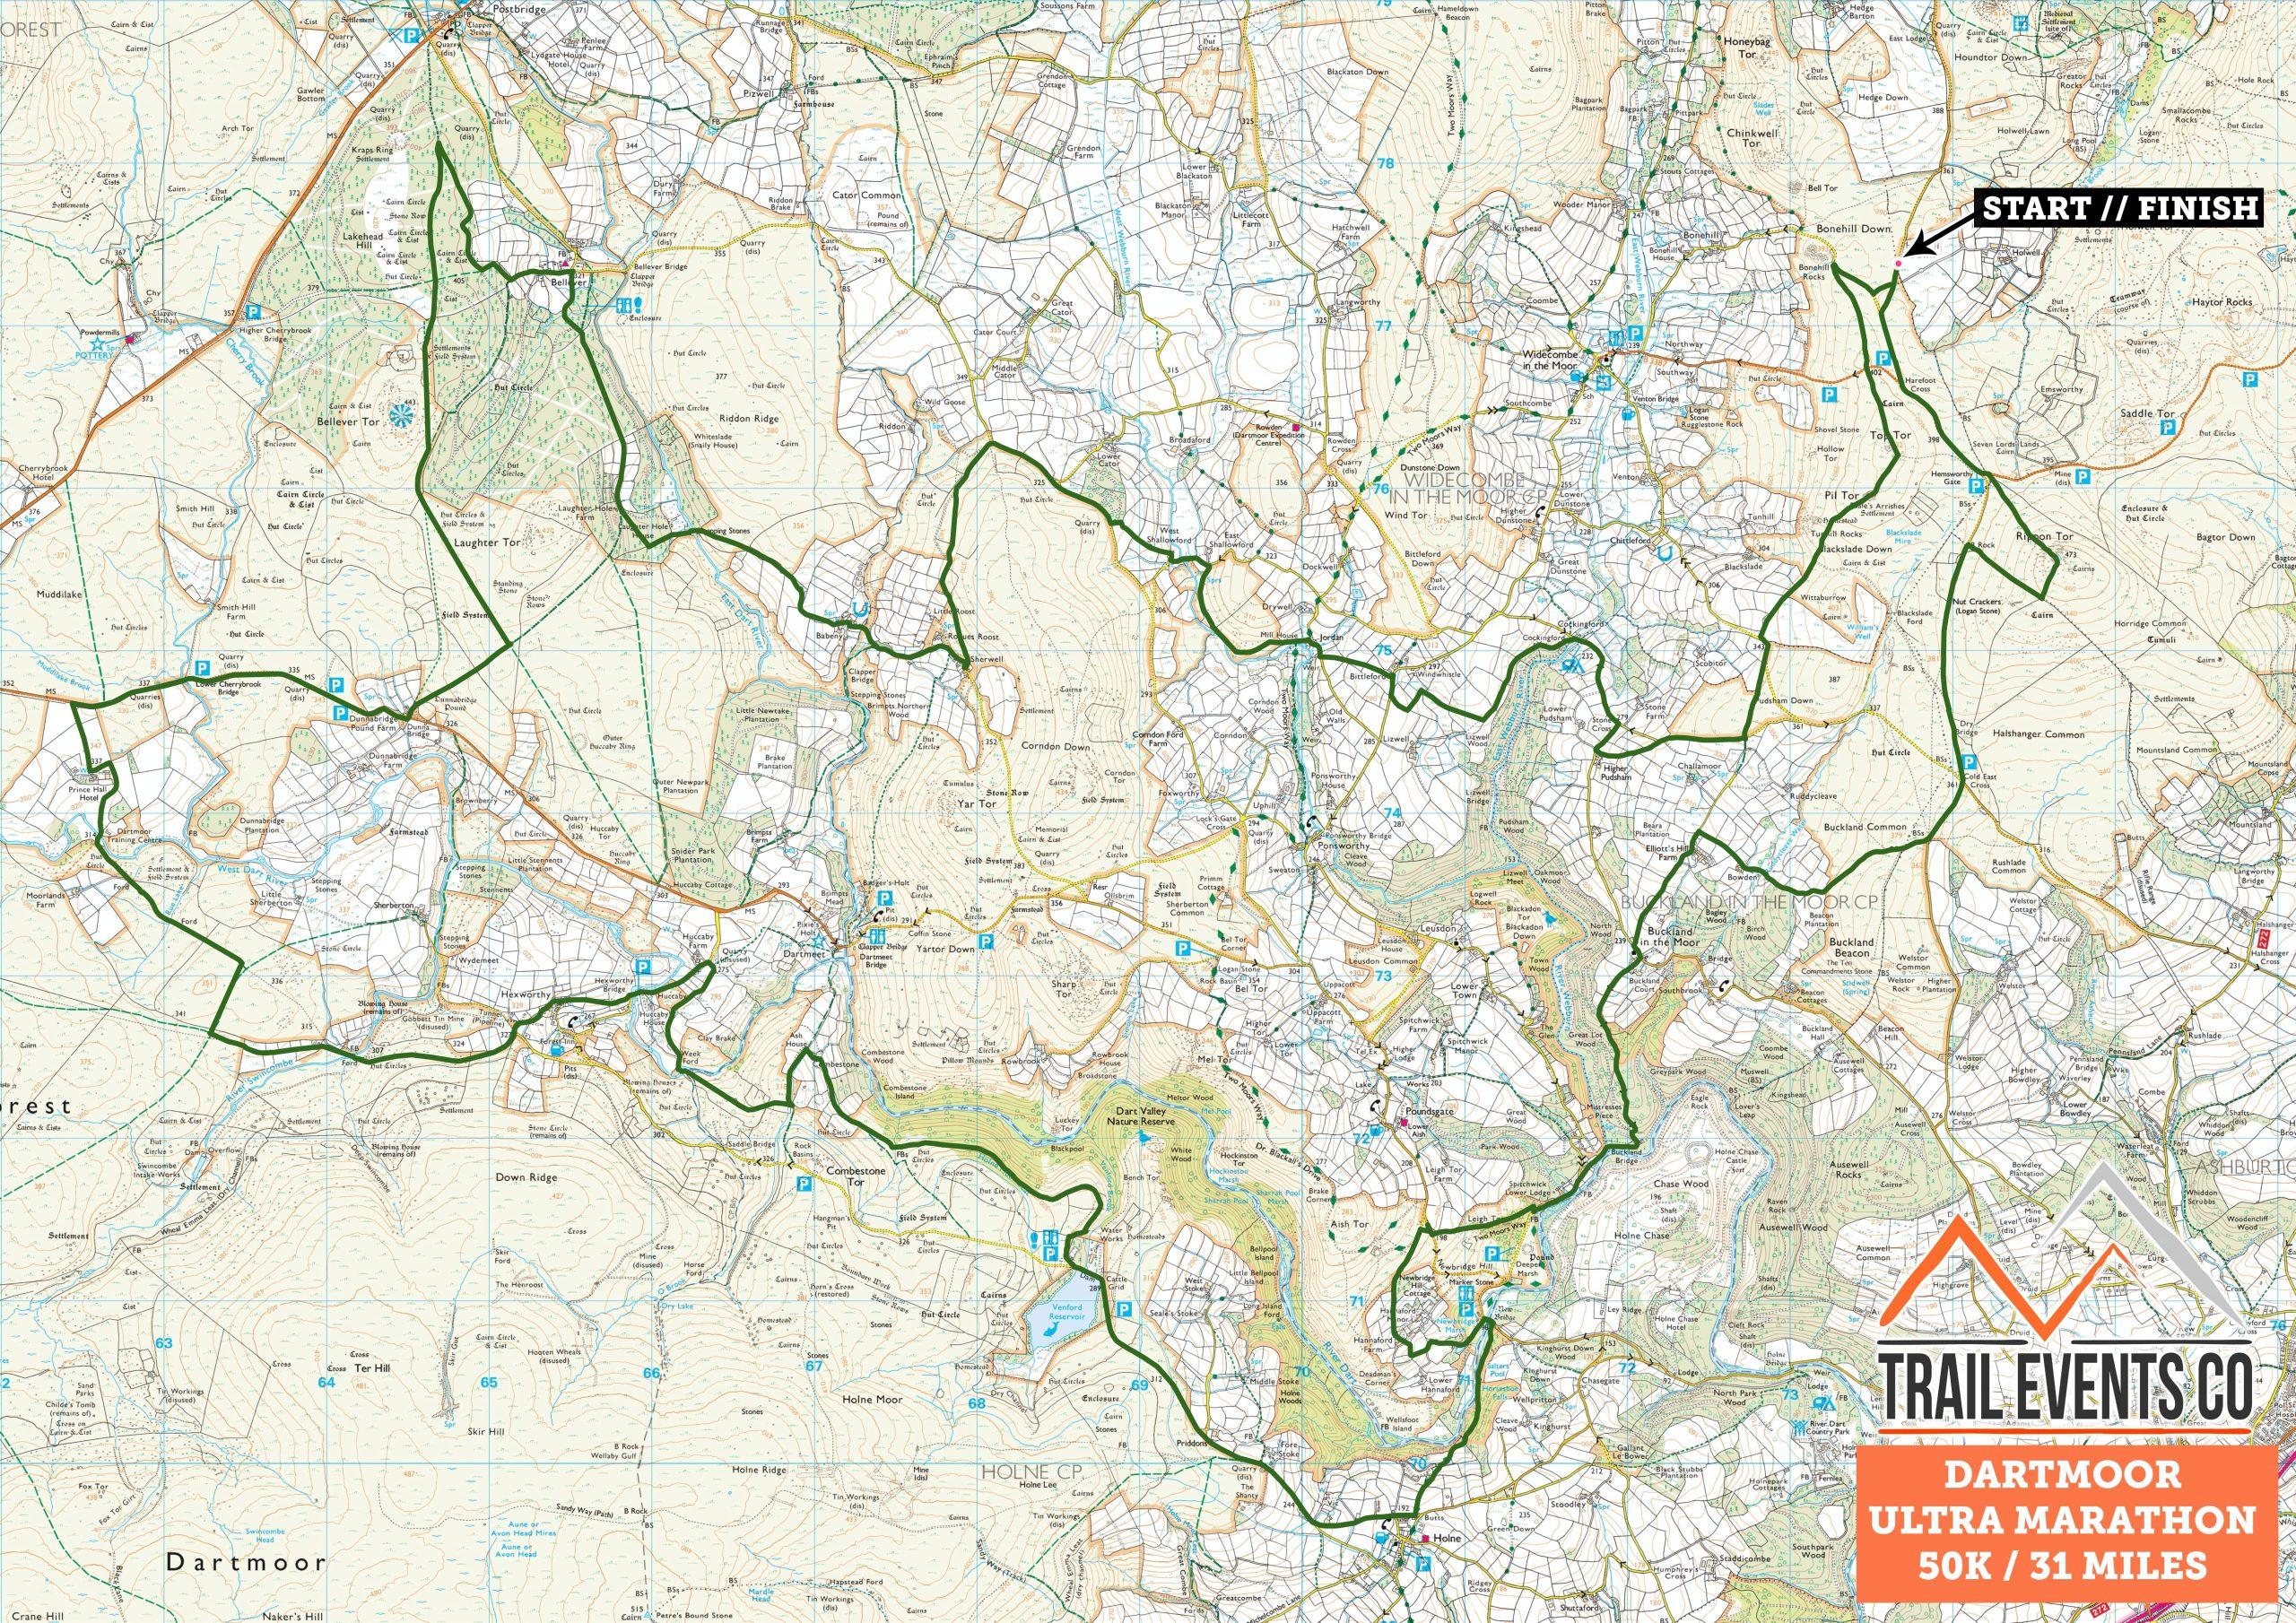 Dartmoor Ultra Marathon